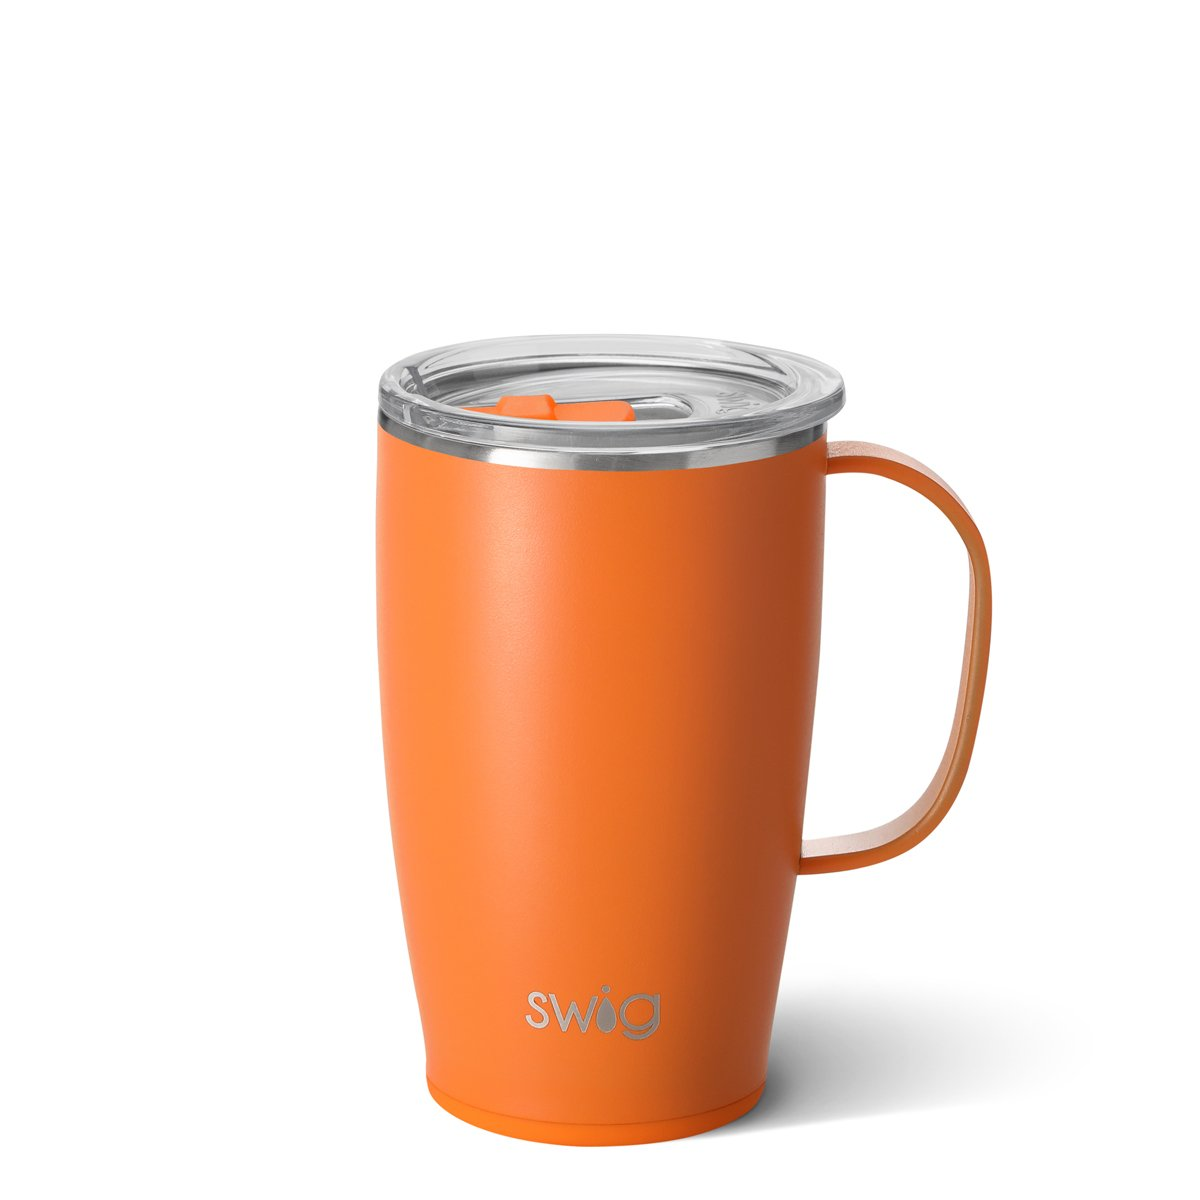 Swig 18 oz. Mug